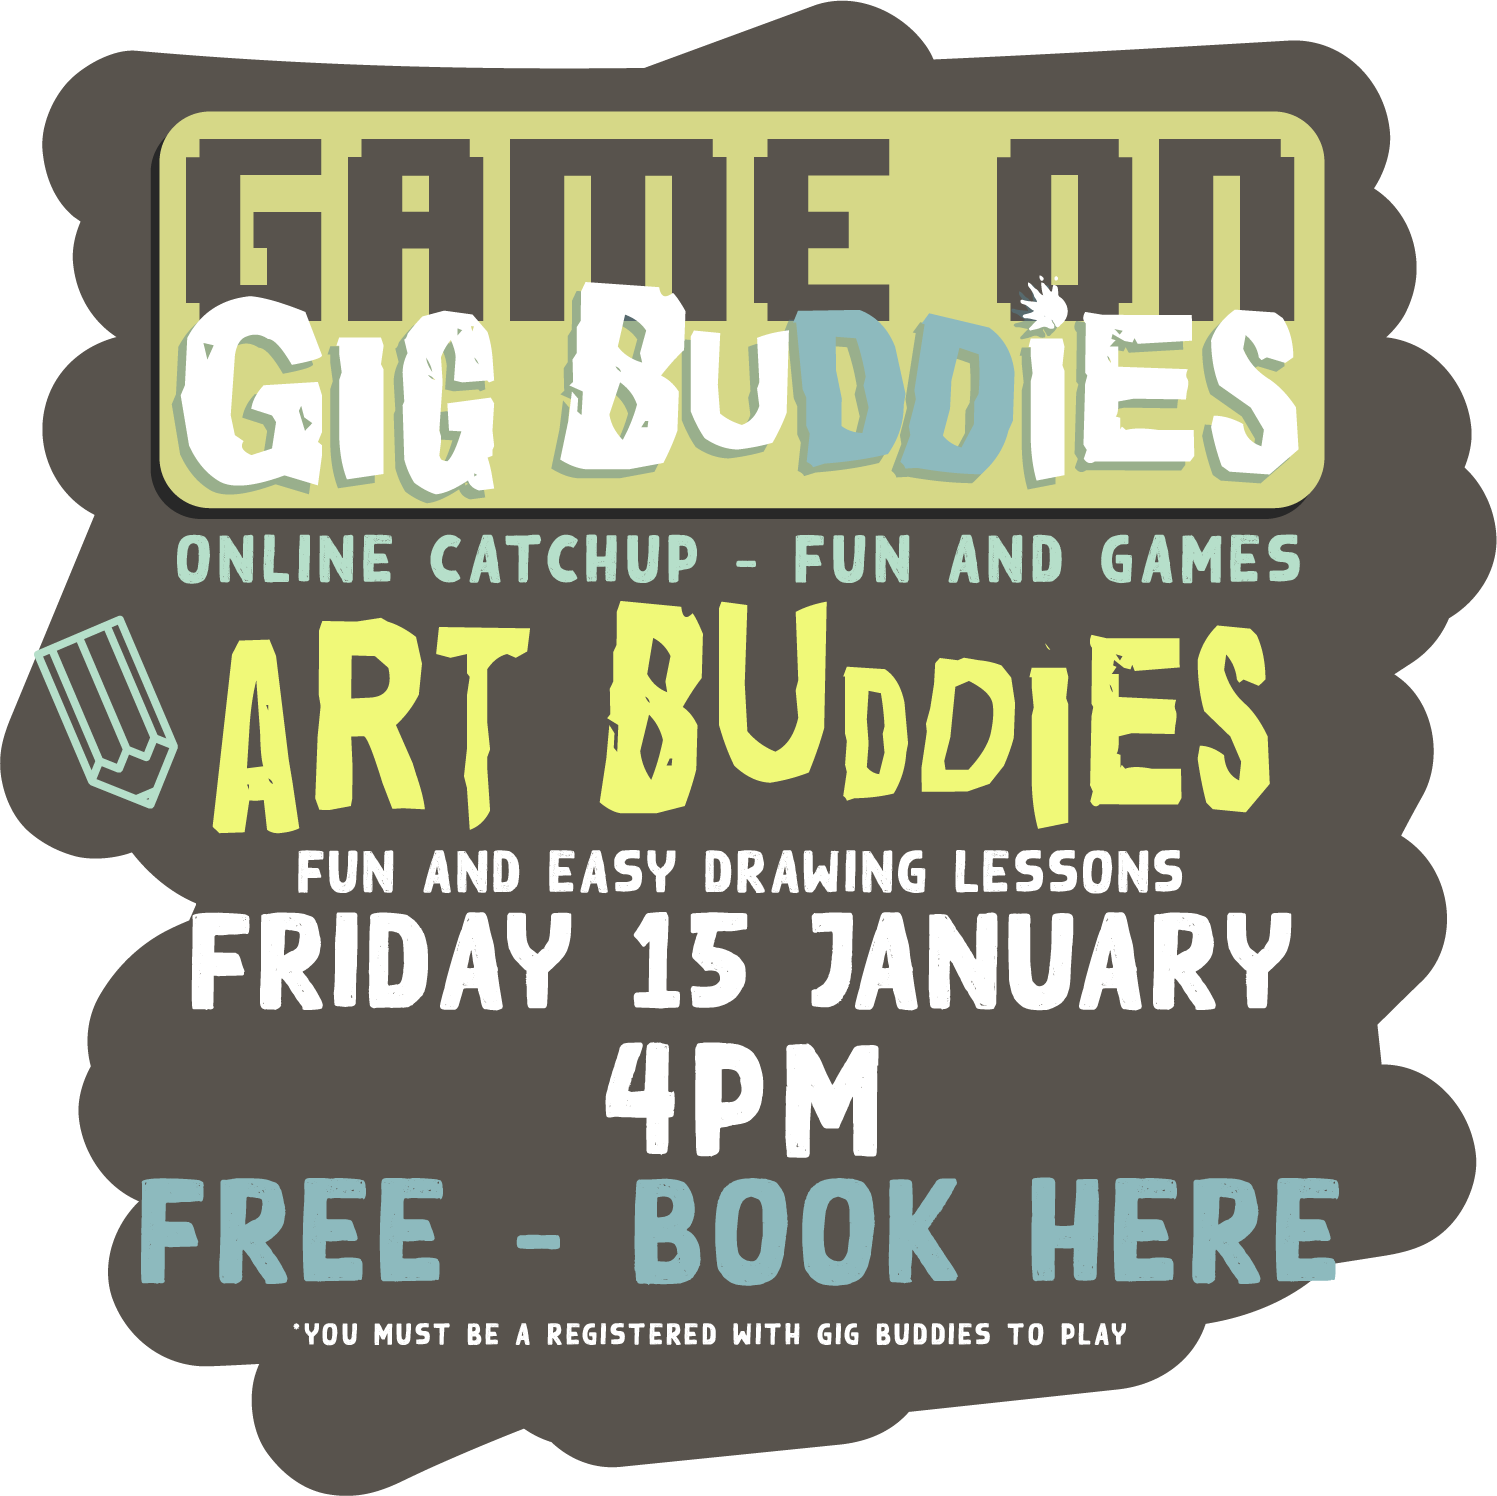 Gig Buddies Sydney art classes Friday 15 January @ 4pm